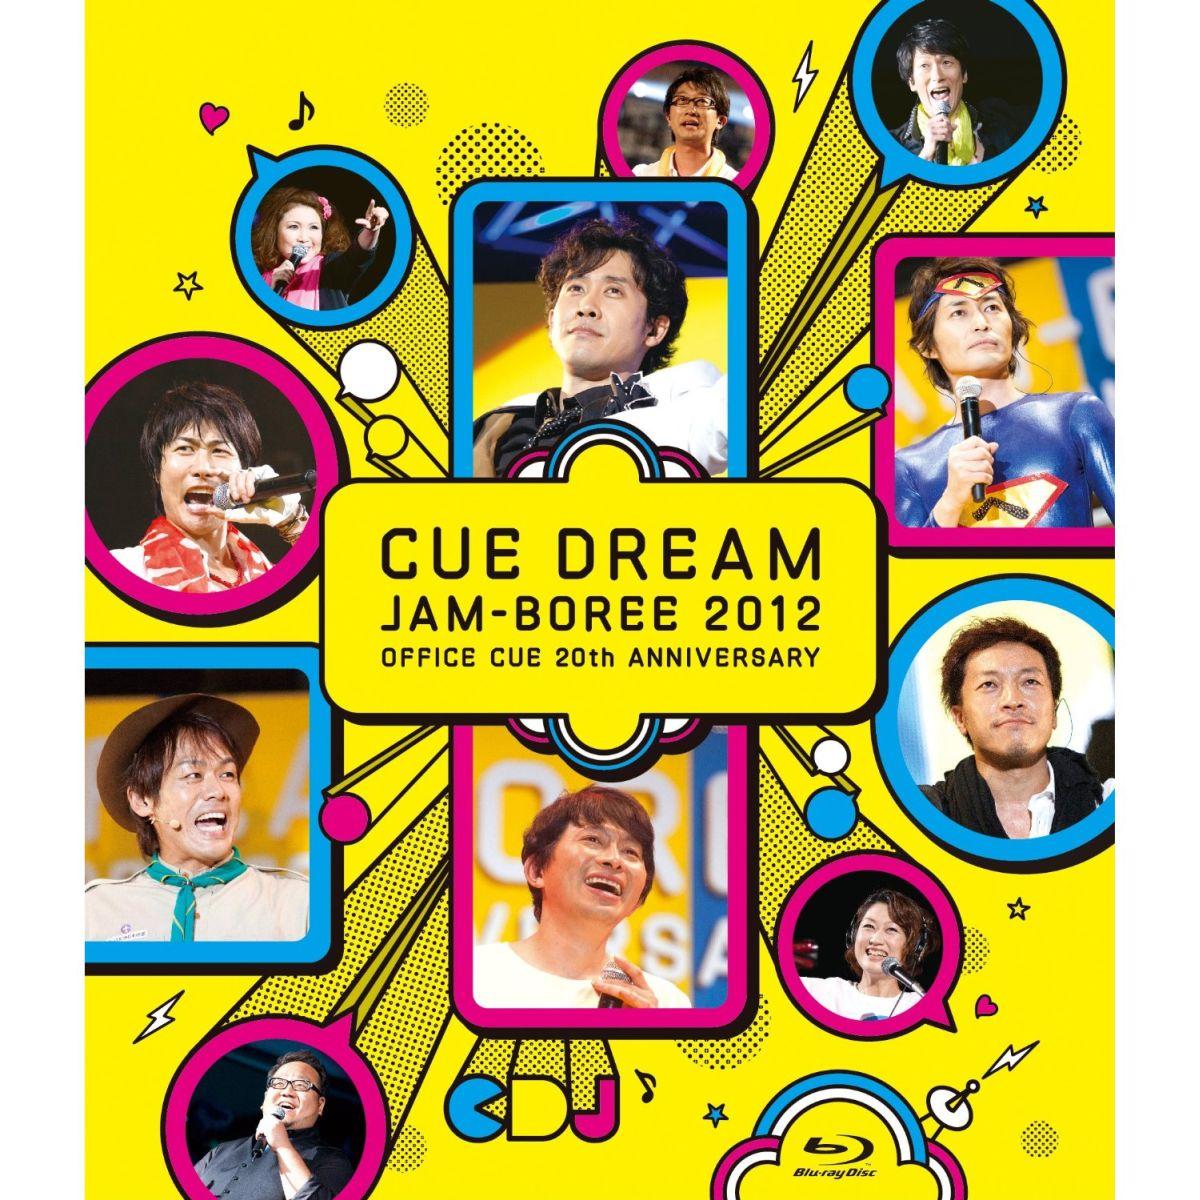 CUE DREAM JAM-BOREE 2012【Blu-ray】